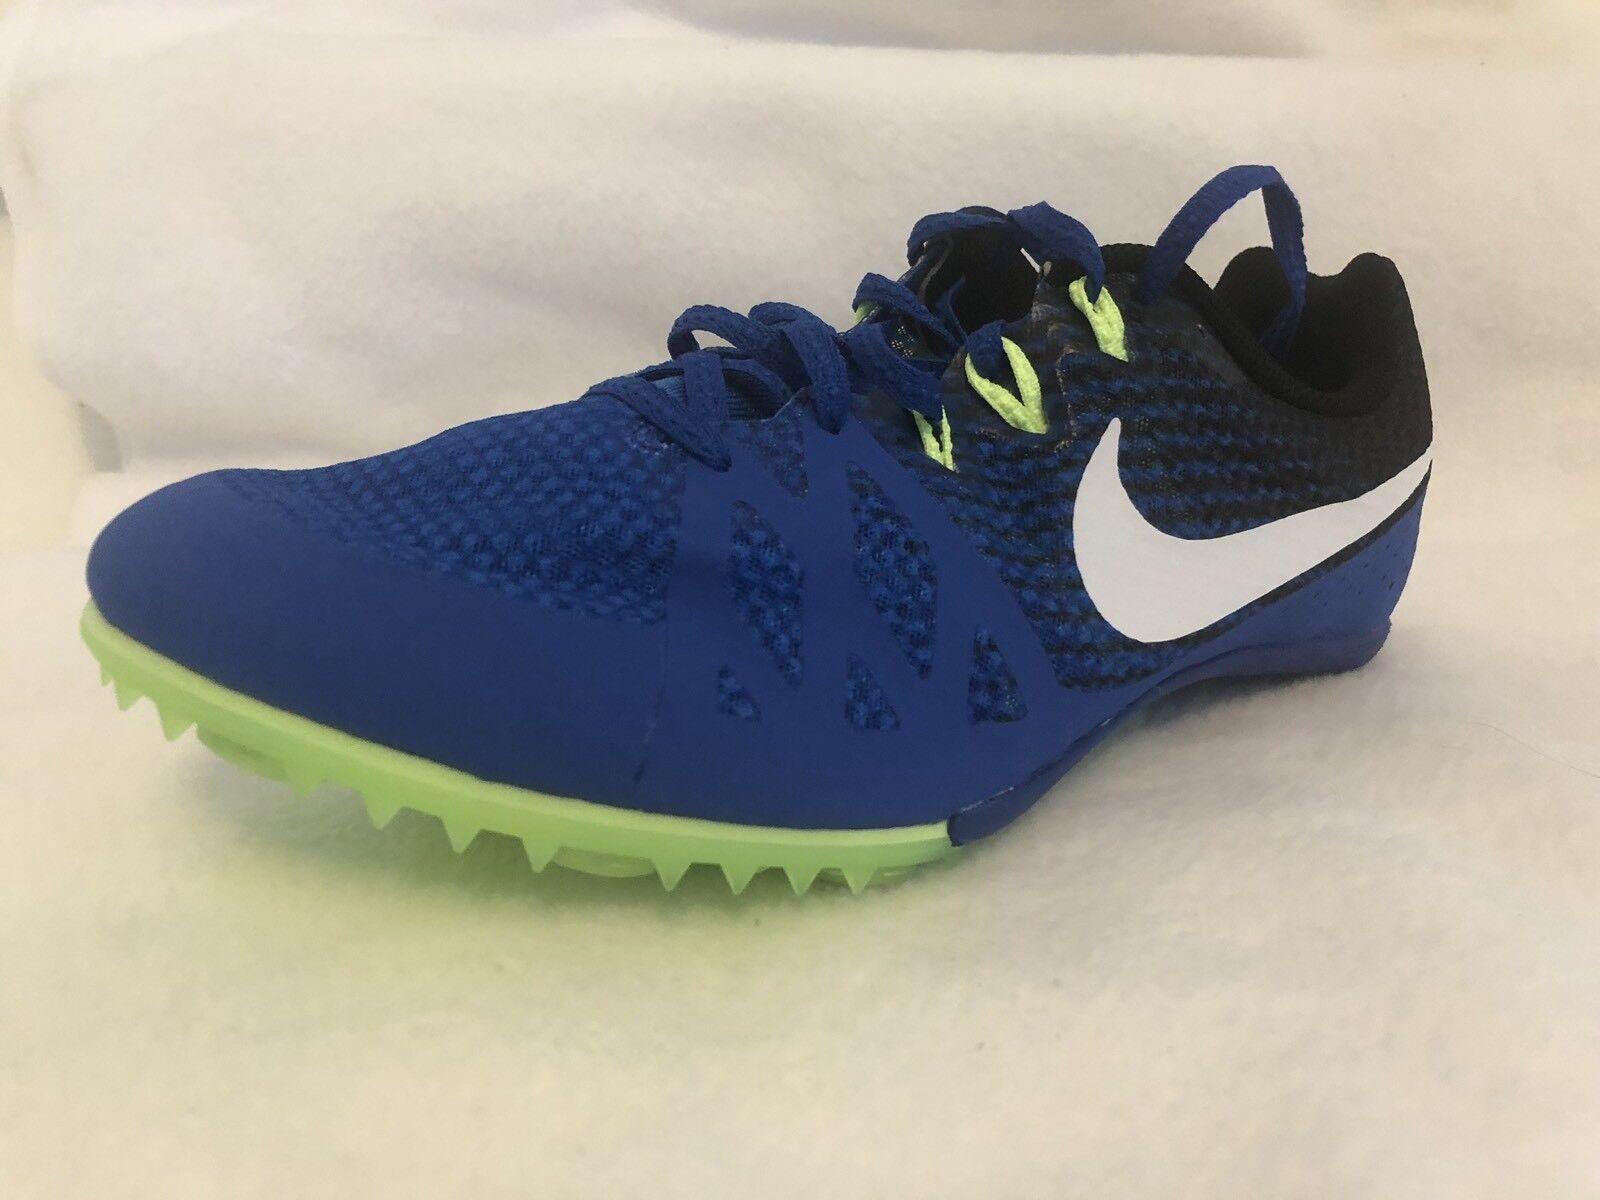 on sale f6bea 3981b ... Nike Zoom Rival M 8 Blue Men s Men s Men s Women s Multi Use Track  Spikes MSRP  70 ...